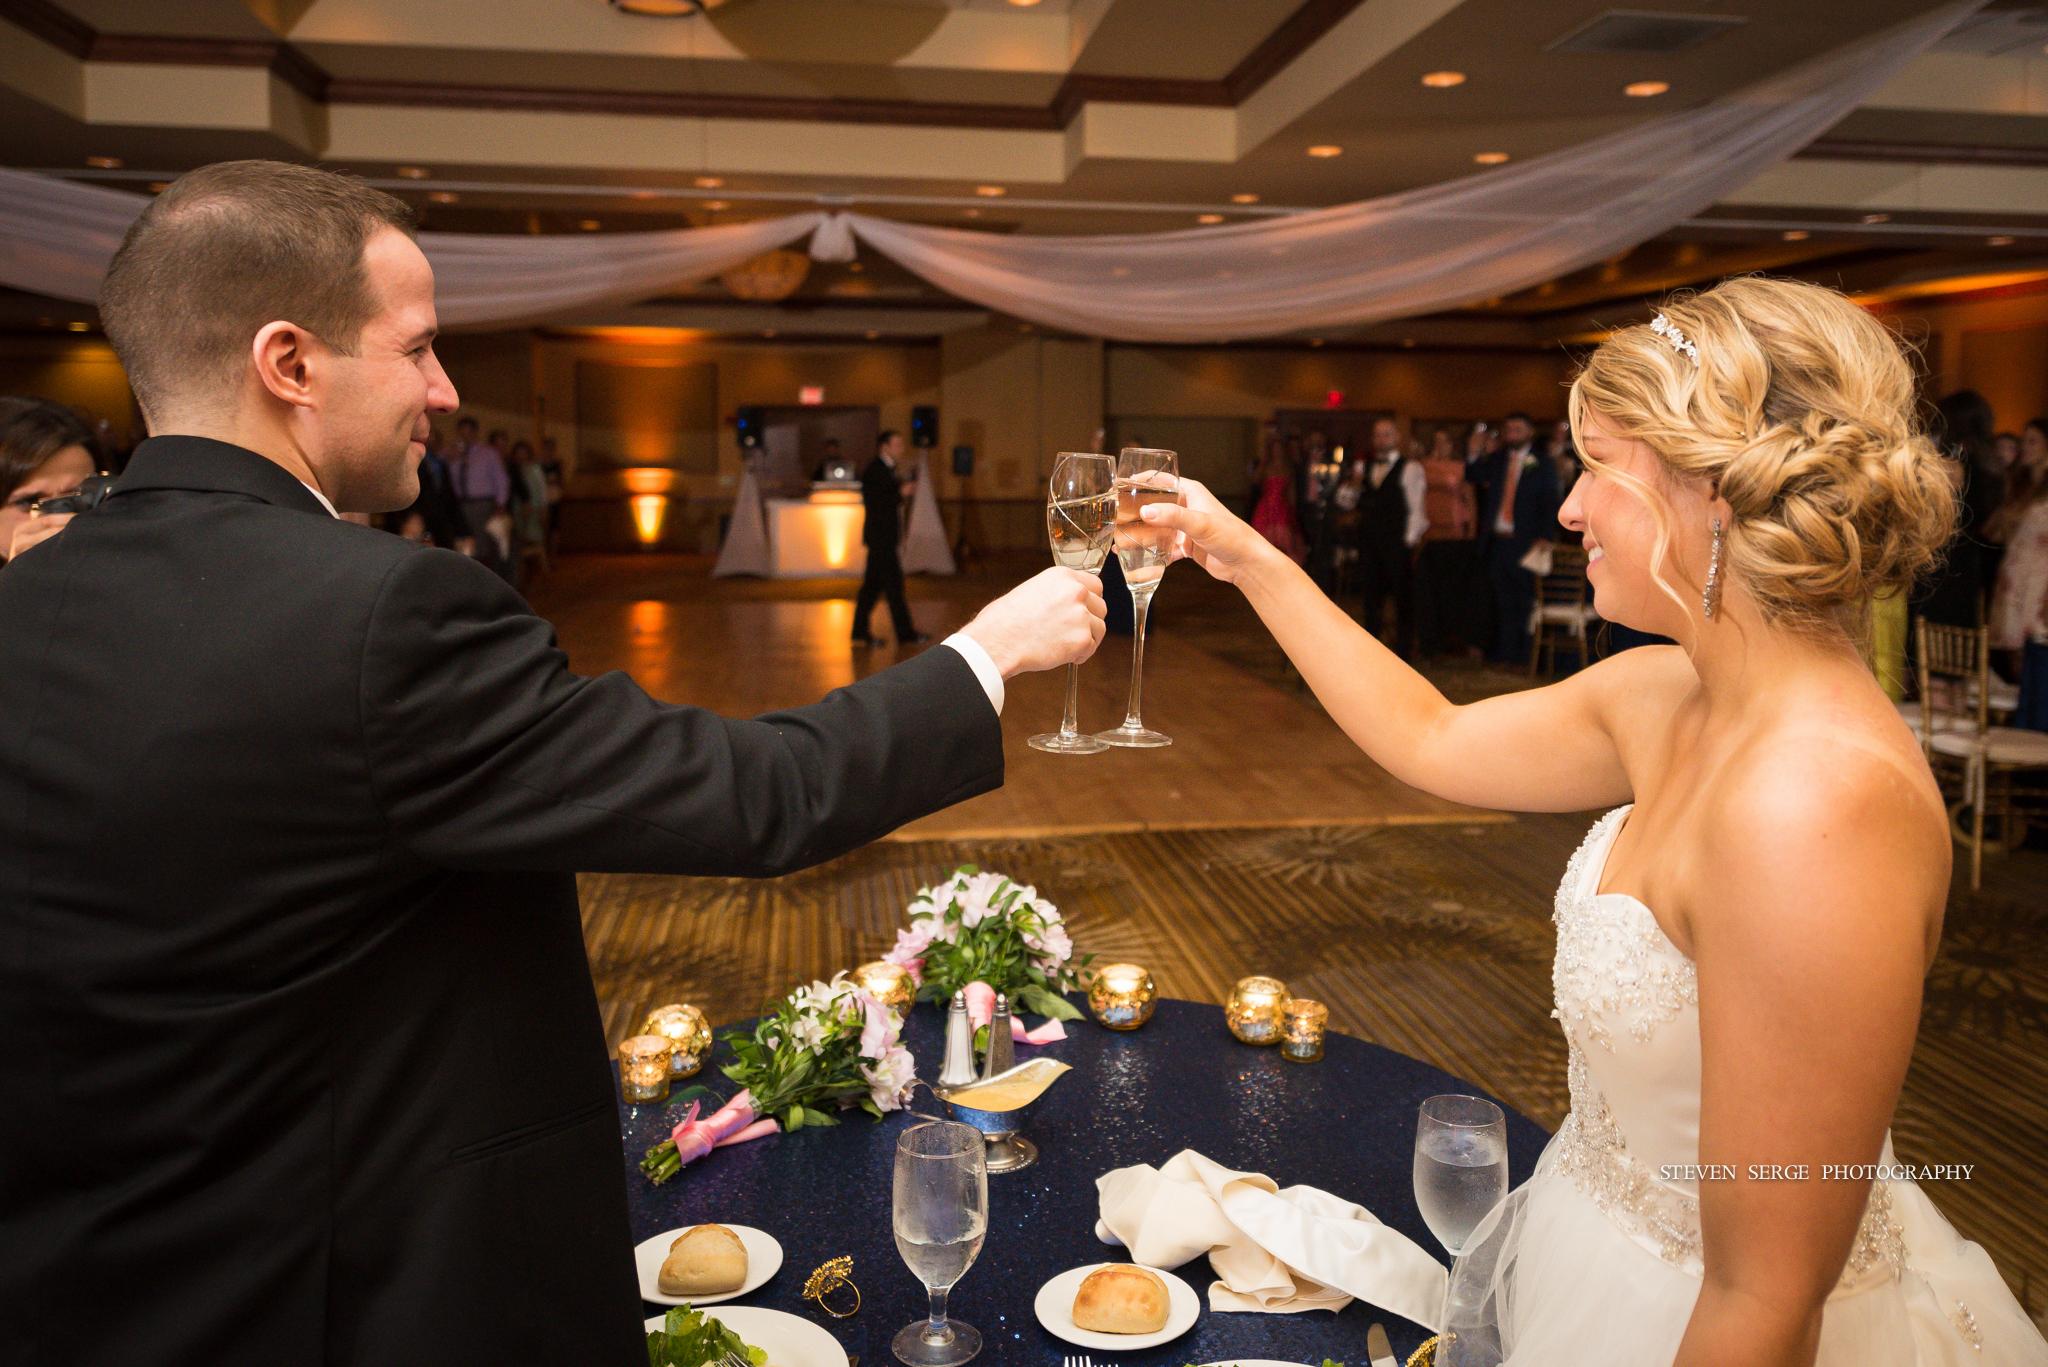 scranton-wedding-photographers-hilton-steven-serge-photography-22.jpg